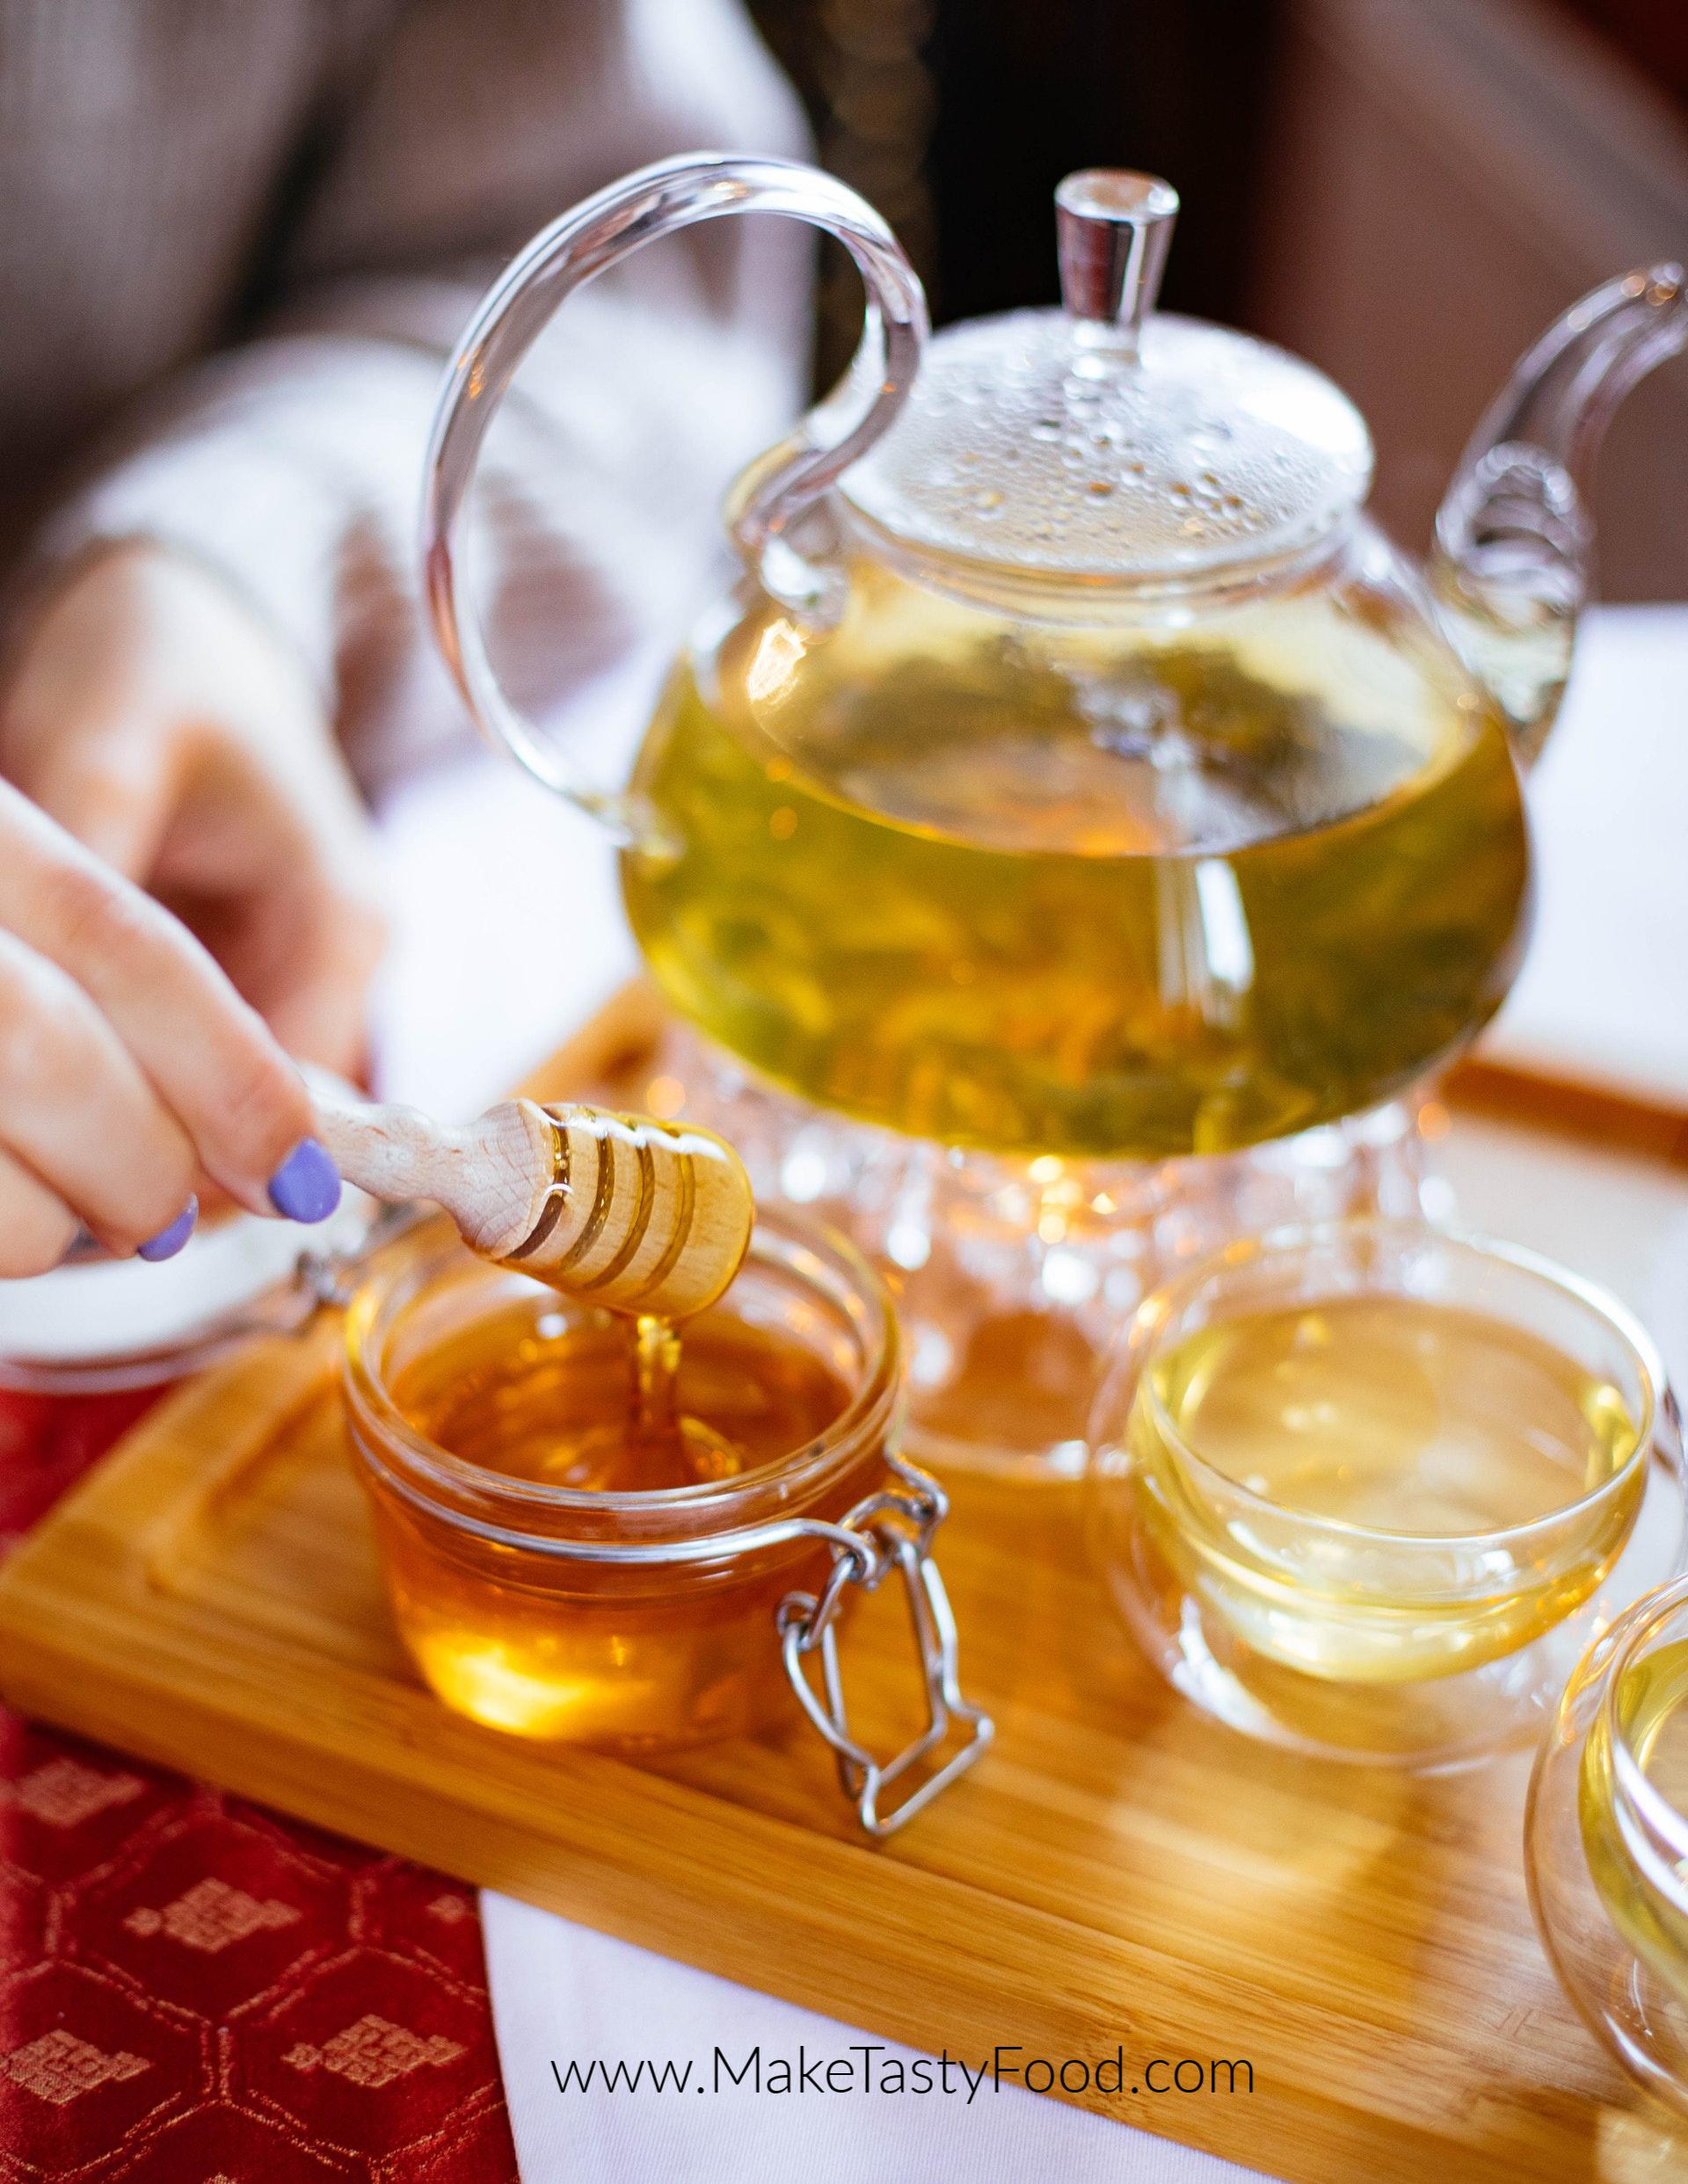 pure organic honey. use it instead of sugar